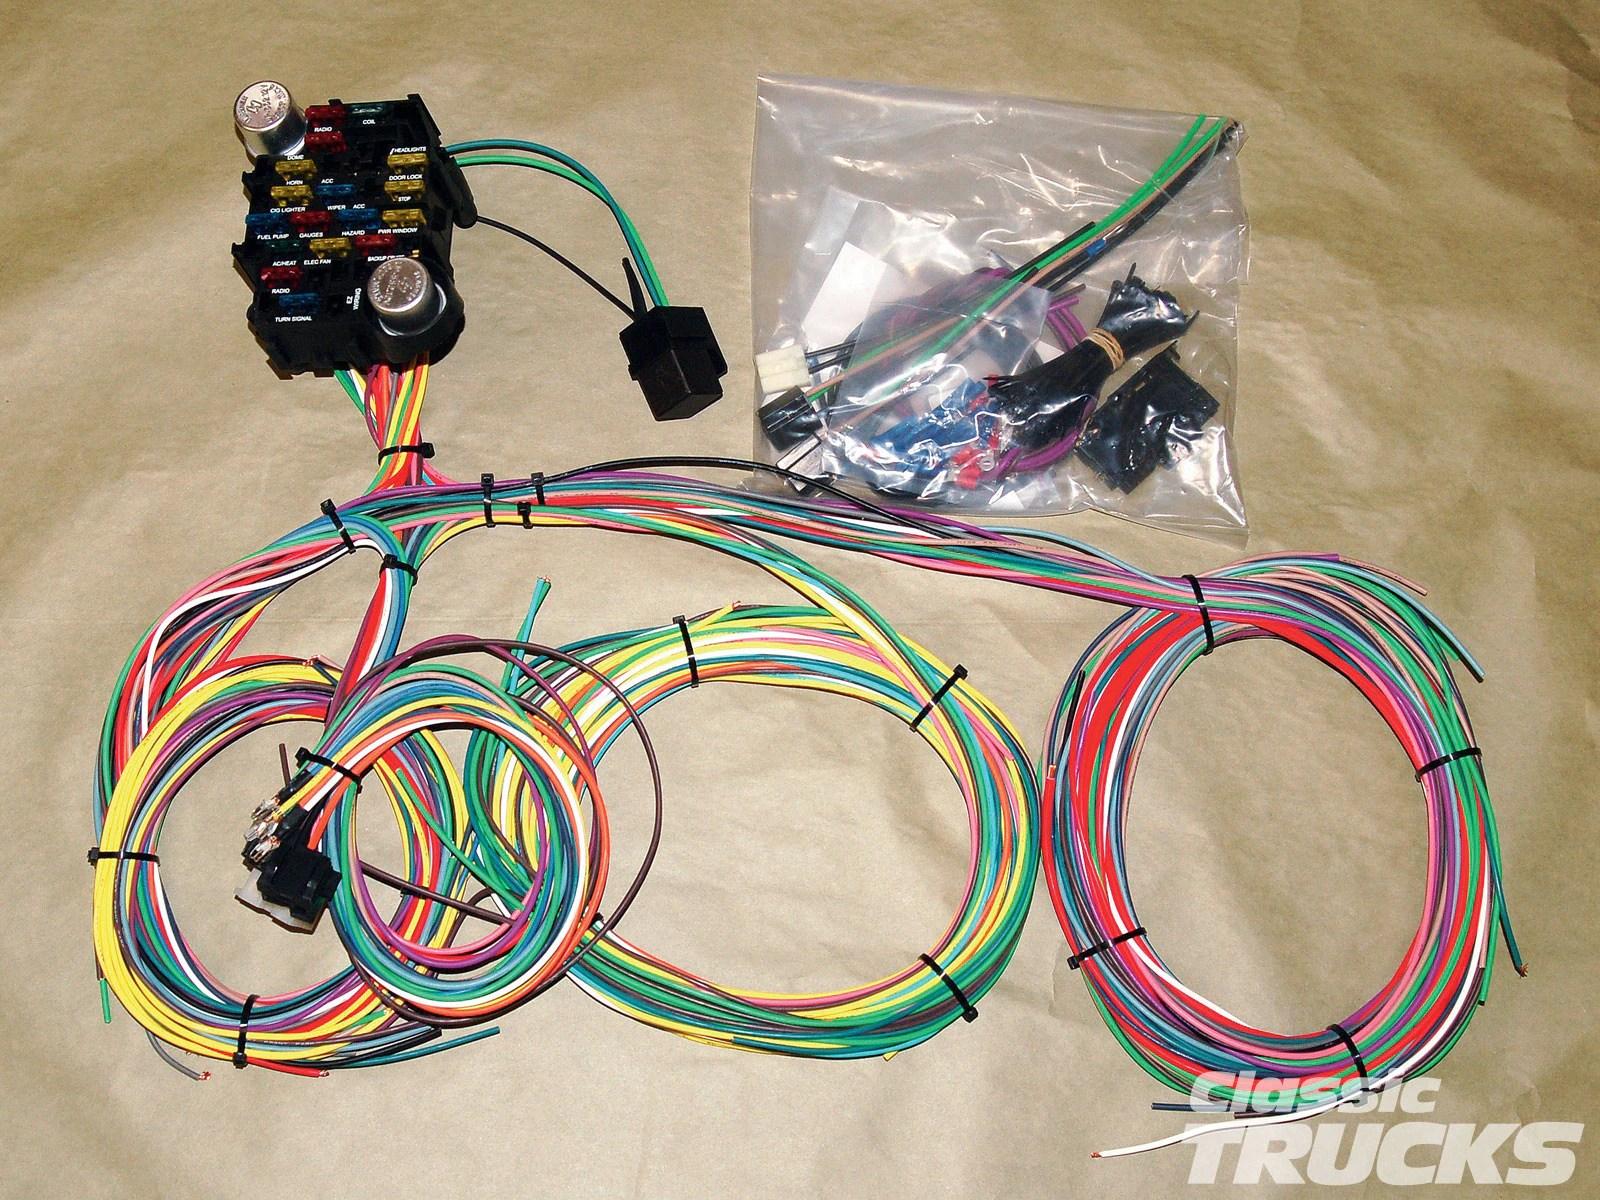 medium resolution of jd 2520 wiring diagram wiring diagram john deere 2520 wiring harness